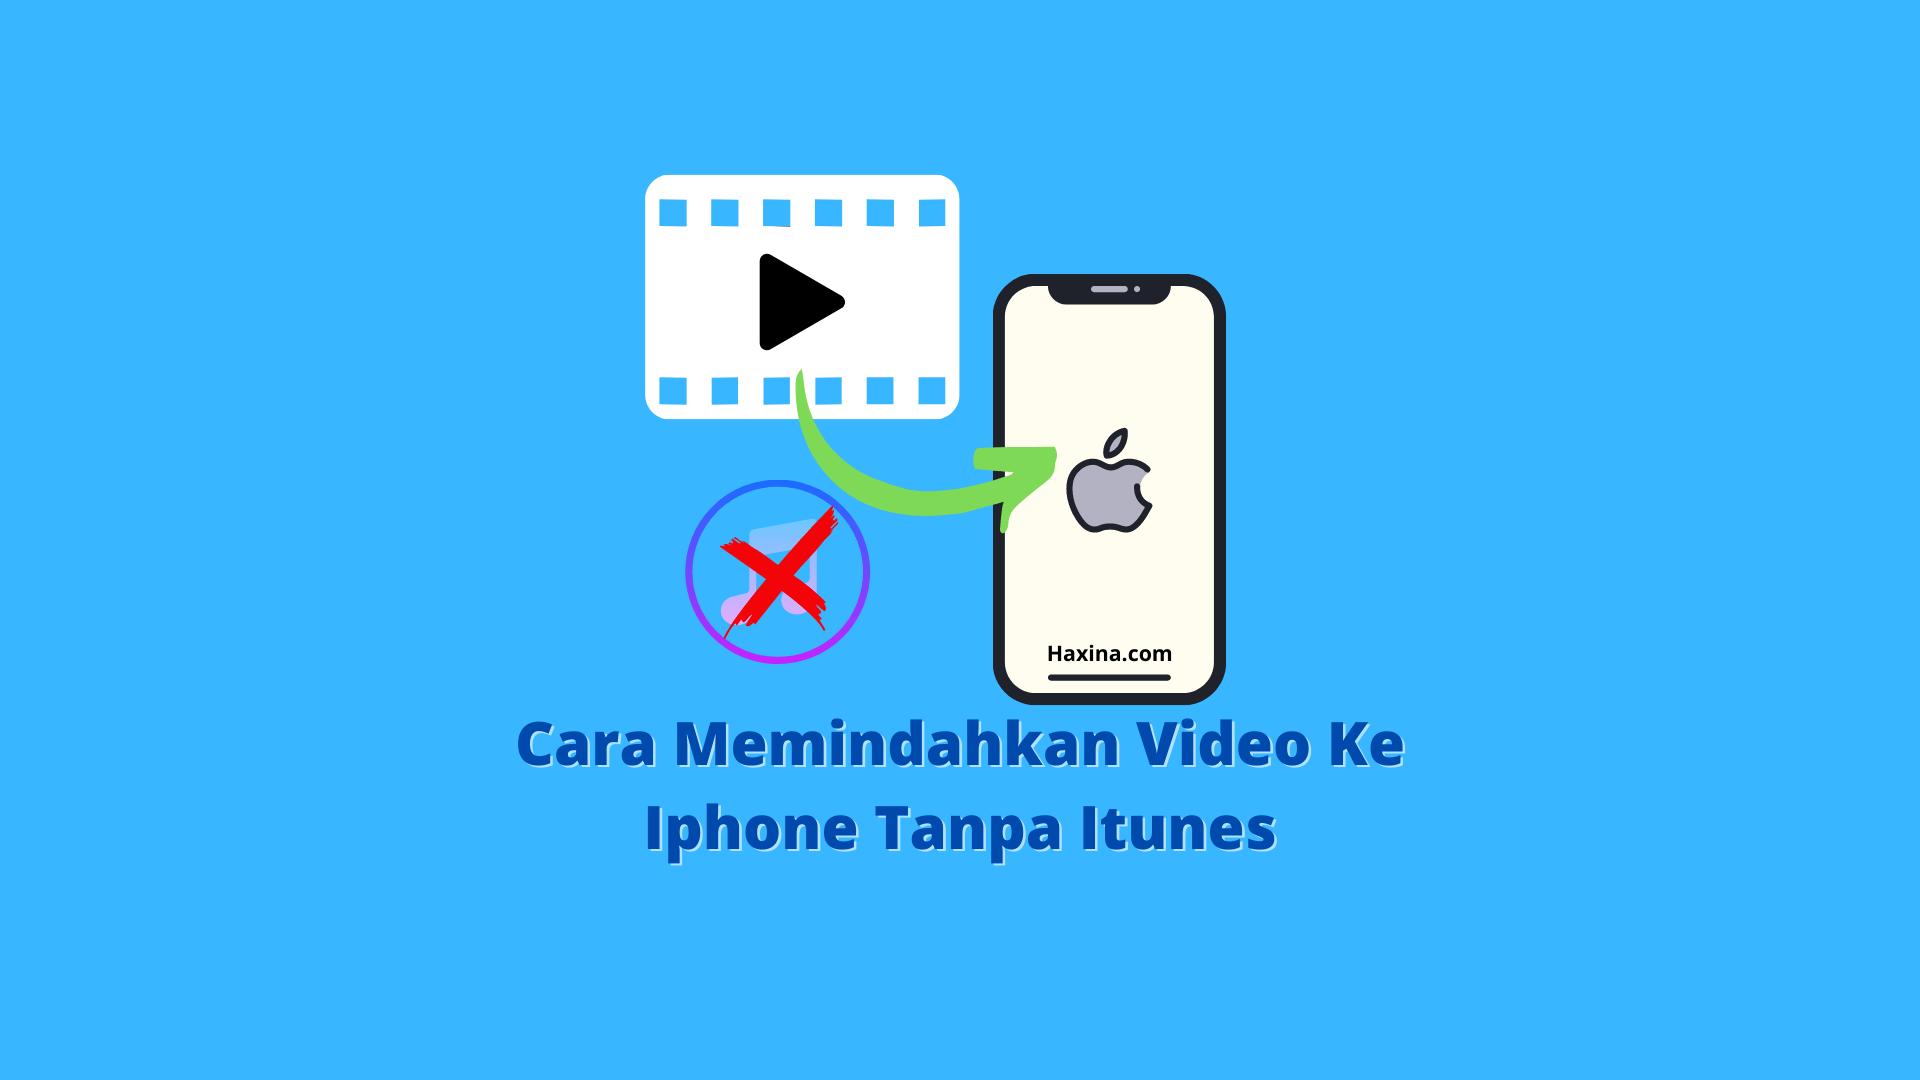 Cara Memindahkan Video Ke Iphone Tanpa Itunes